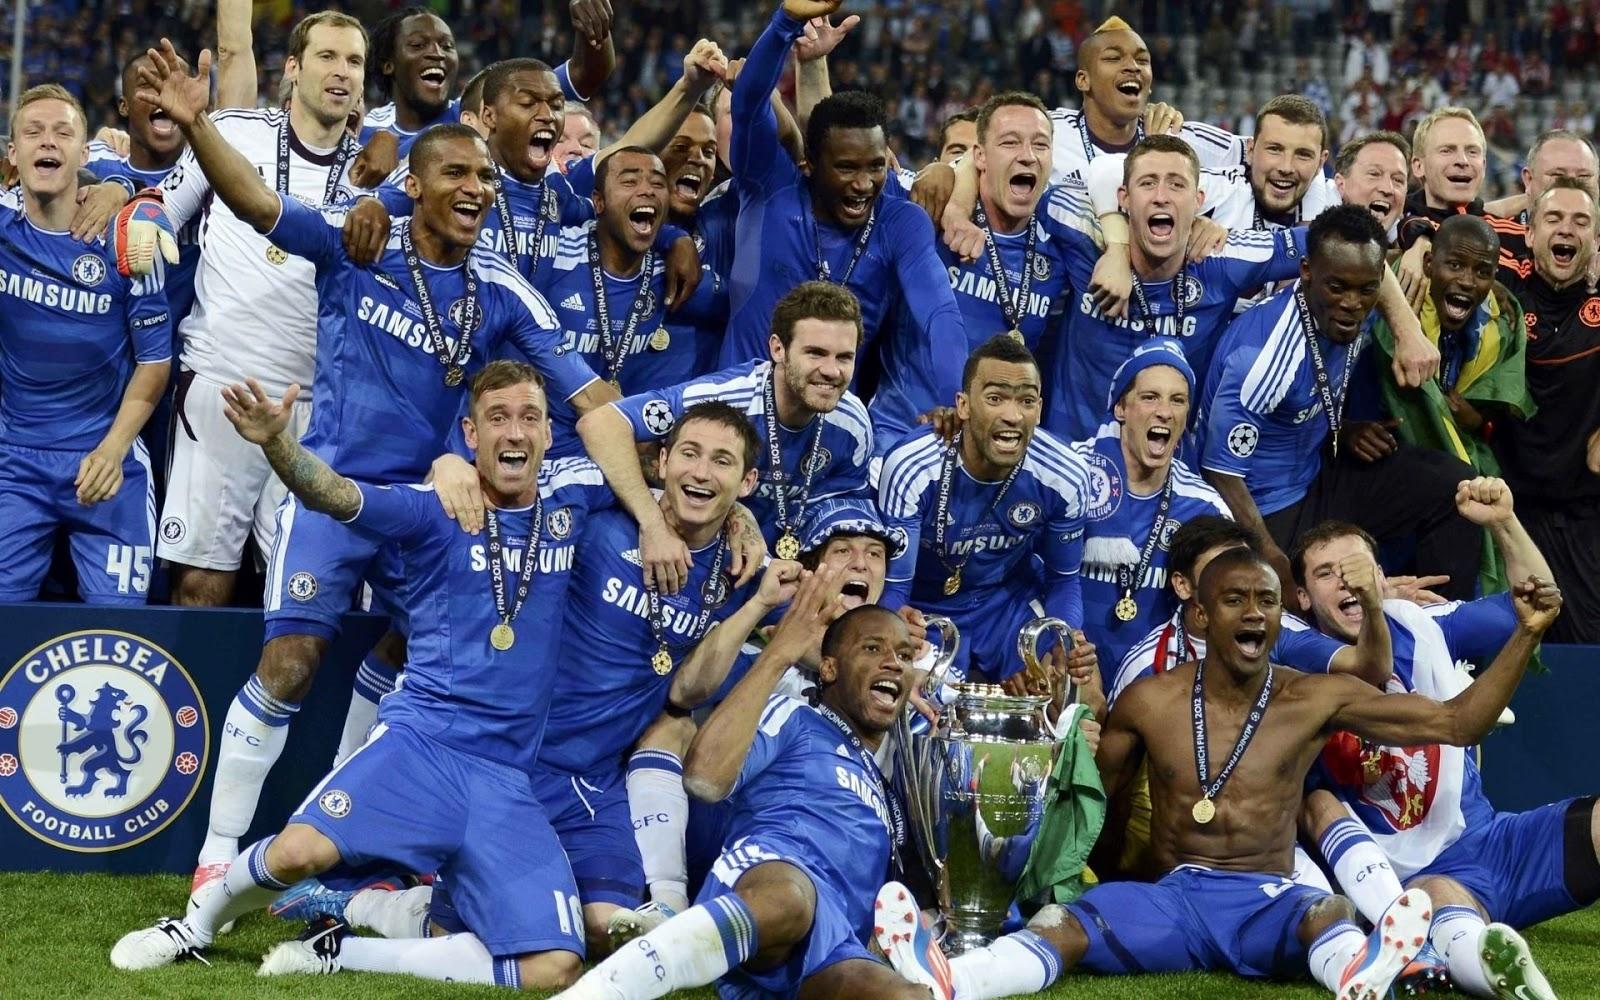 Chelsea FC Wallpaper 1600x1000